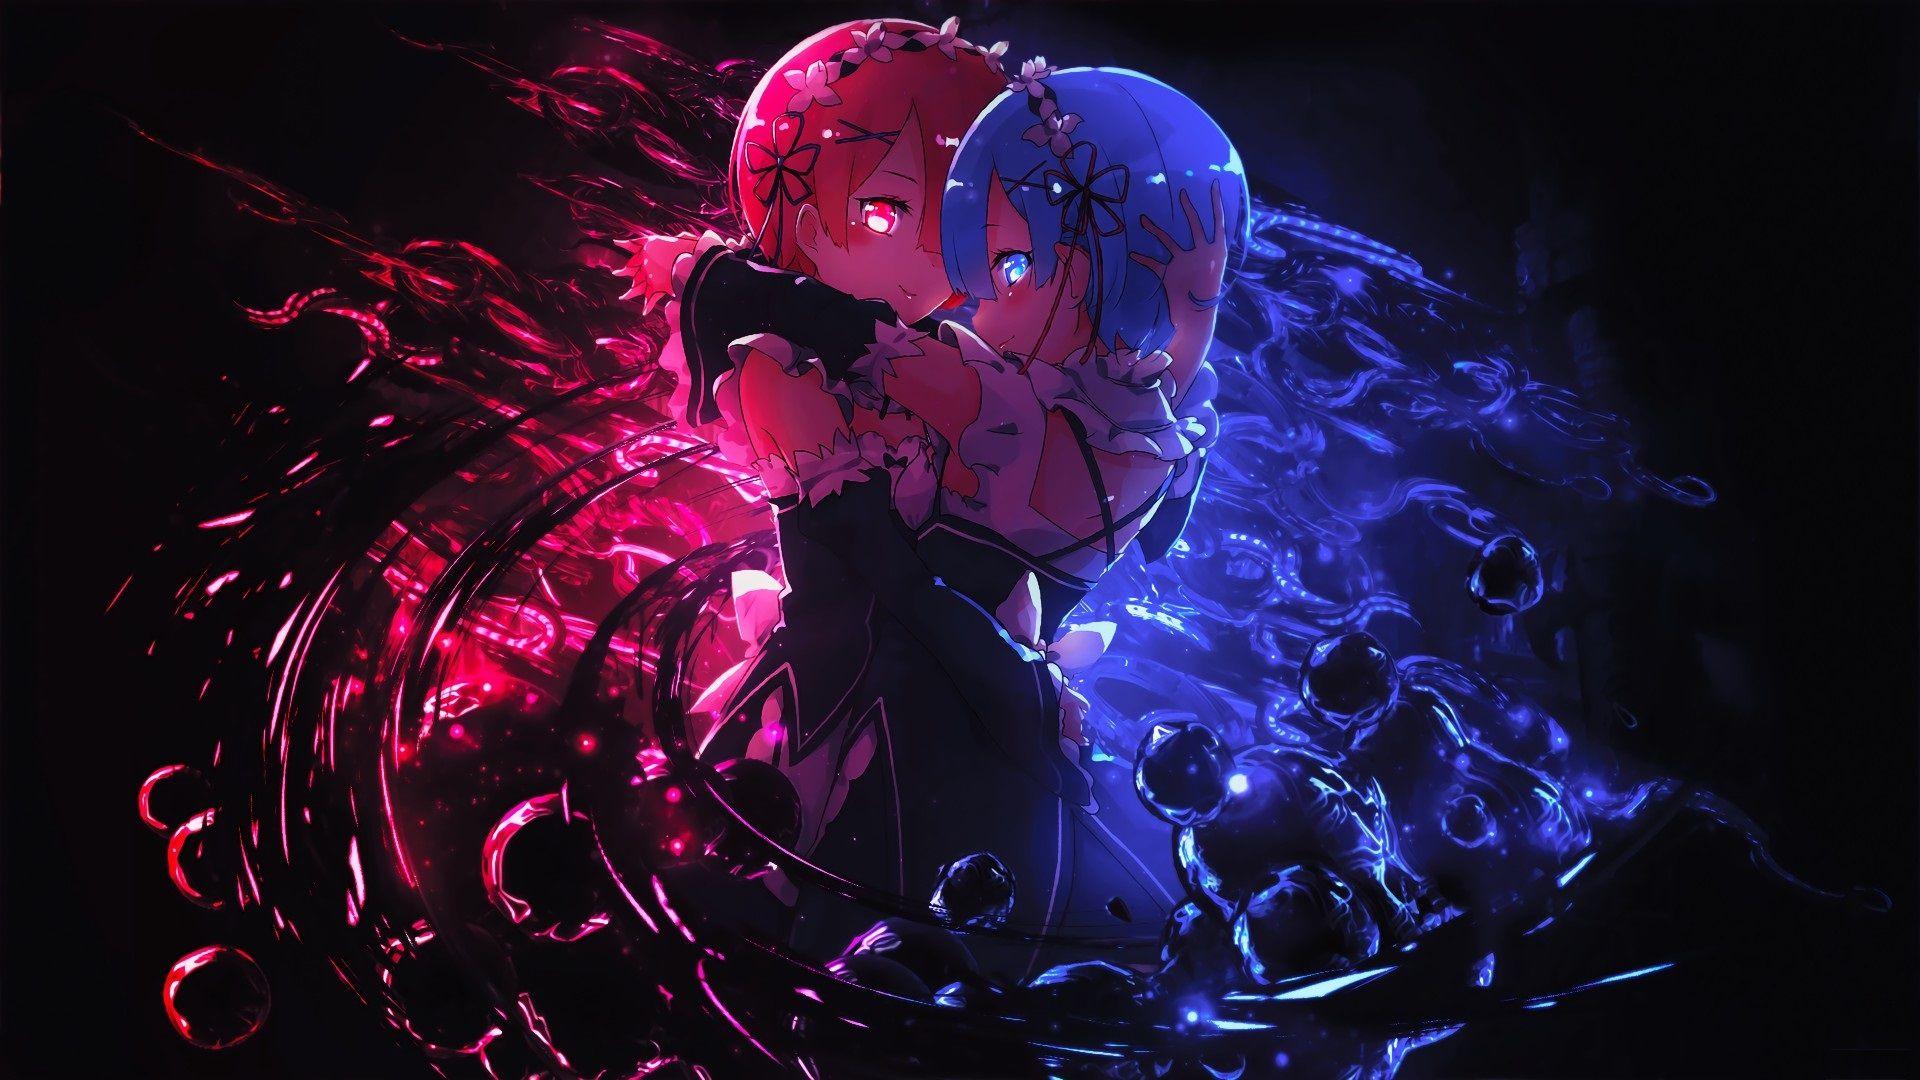 Anime Wallpaper Best Wallpaper Hd In 2020 Anime Wallpaper 1920x1080 Anime Background Anime Wallpaper